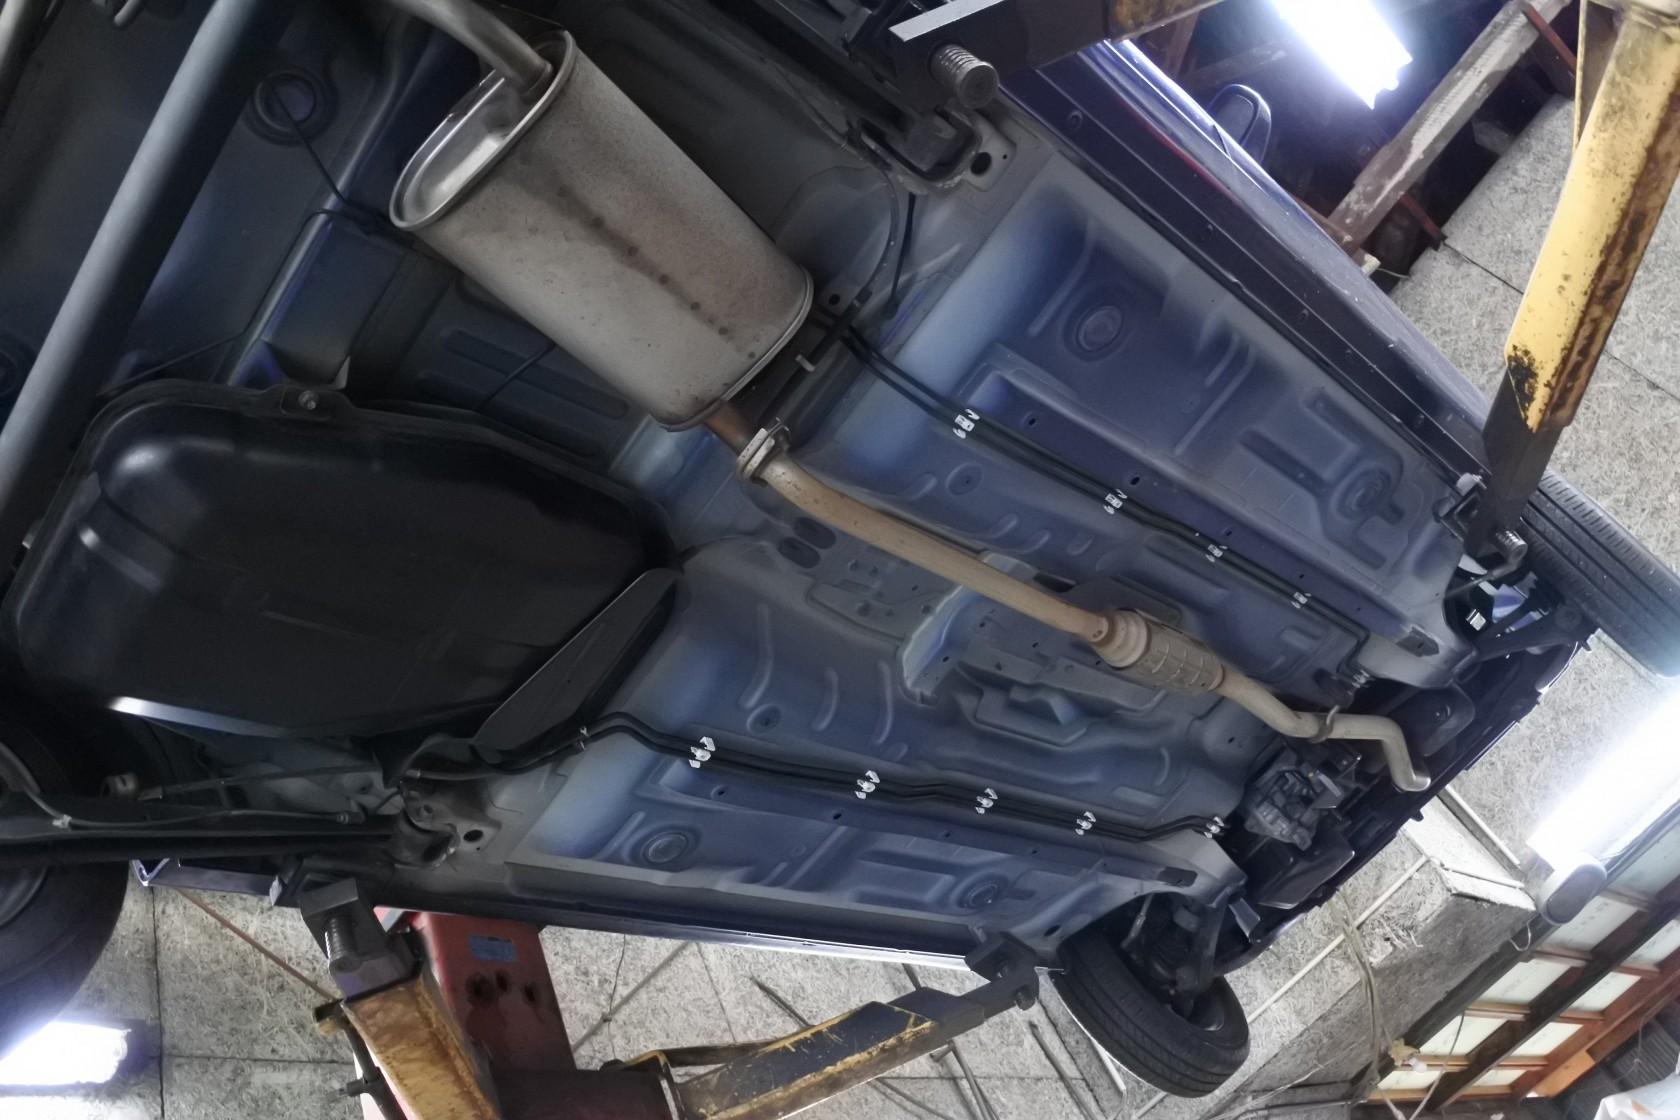 中古車 日産 モコ 青 車体下